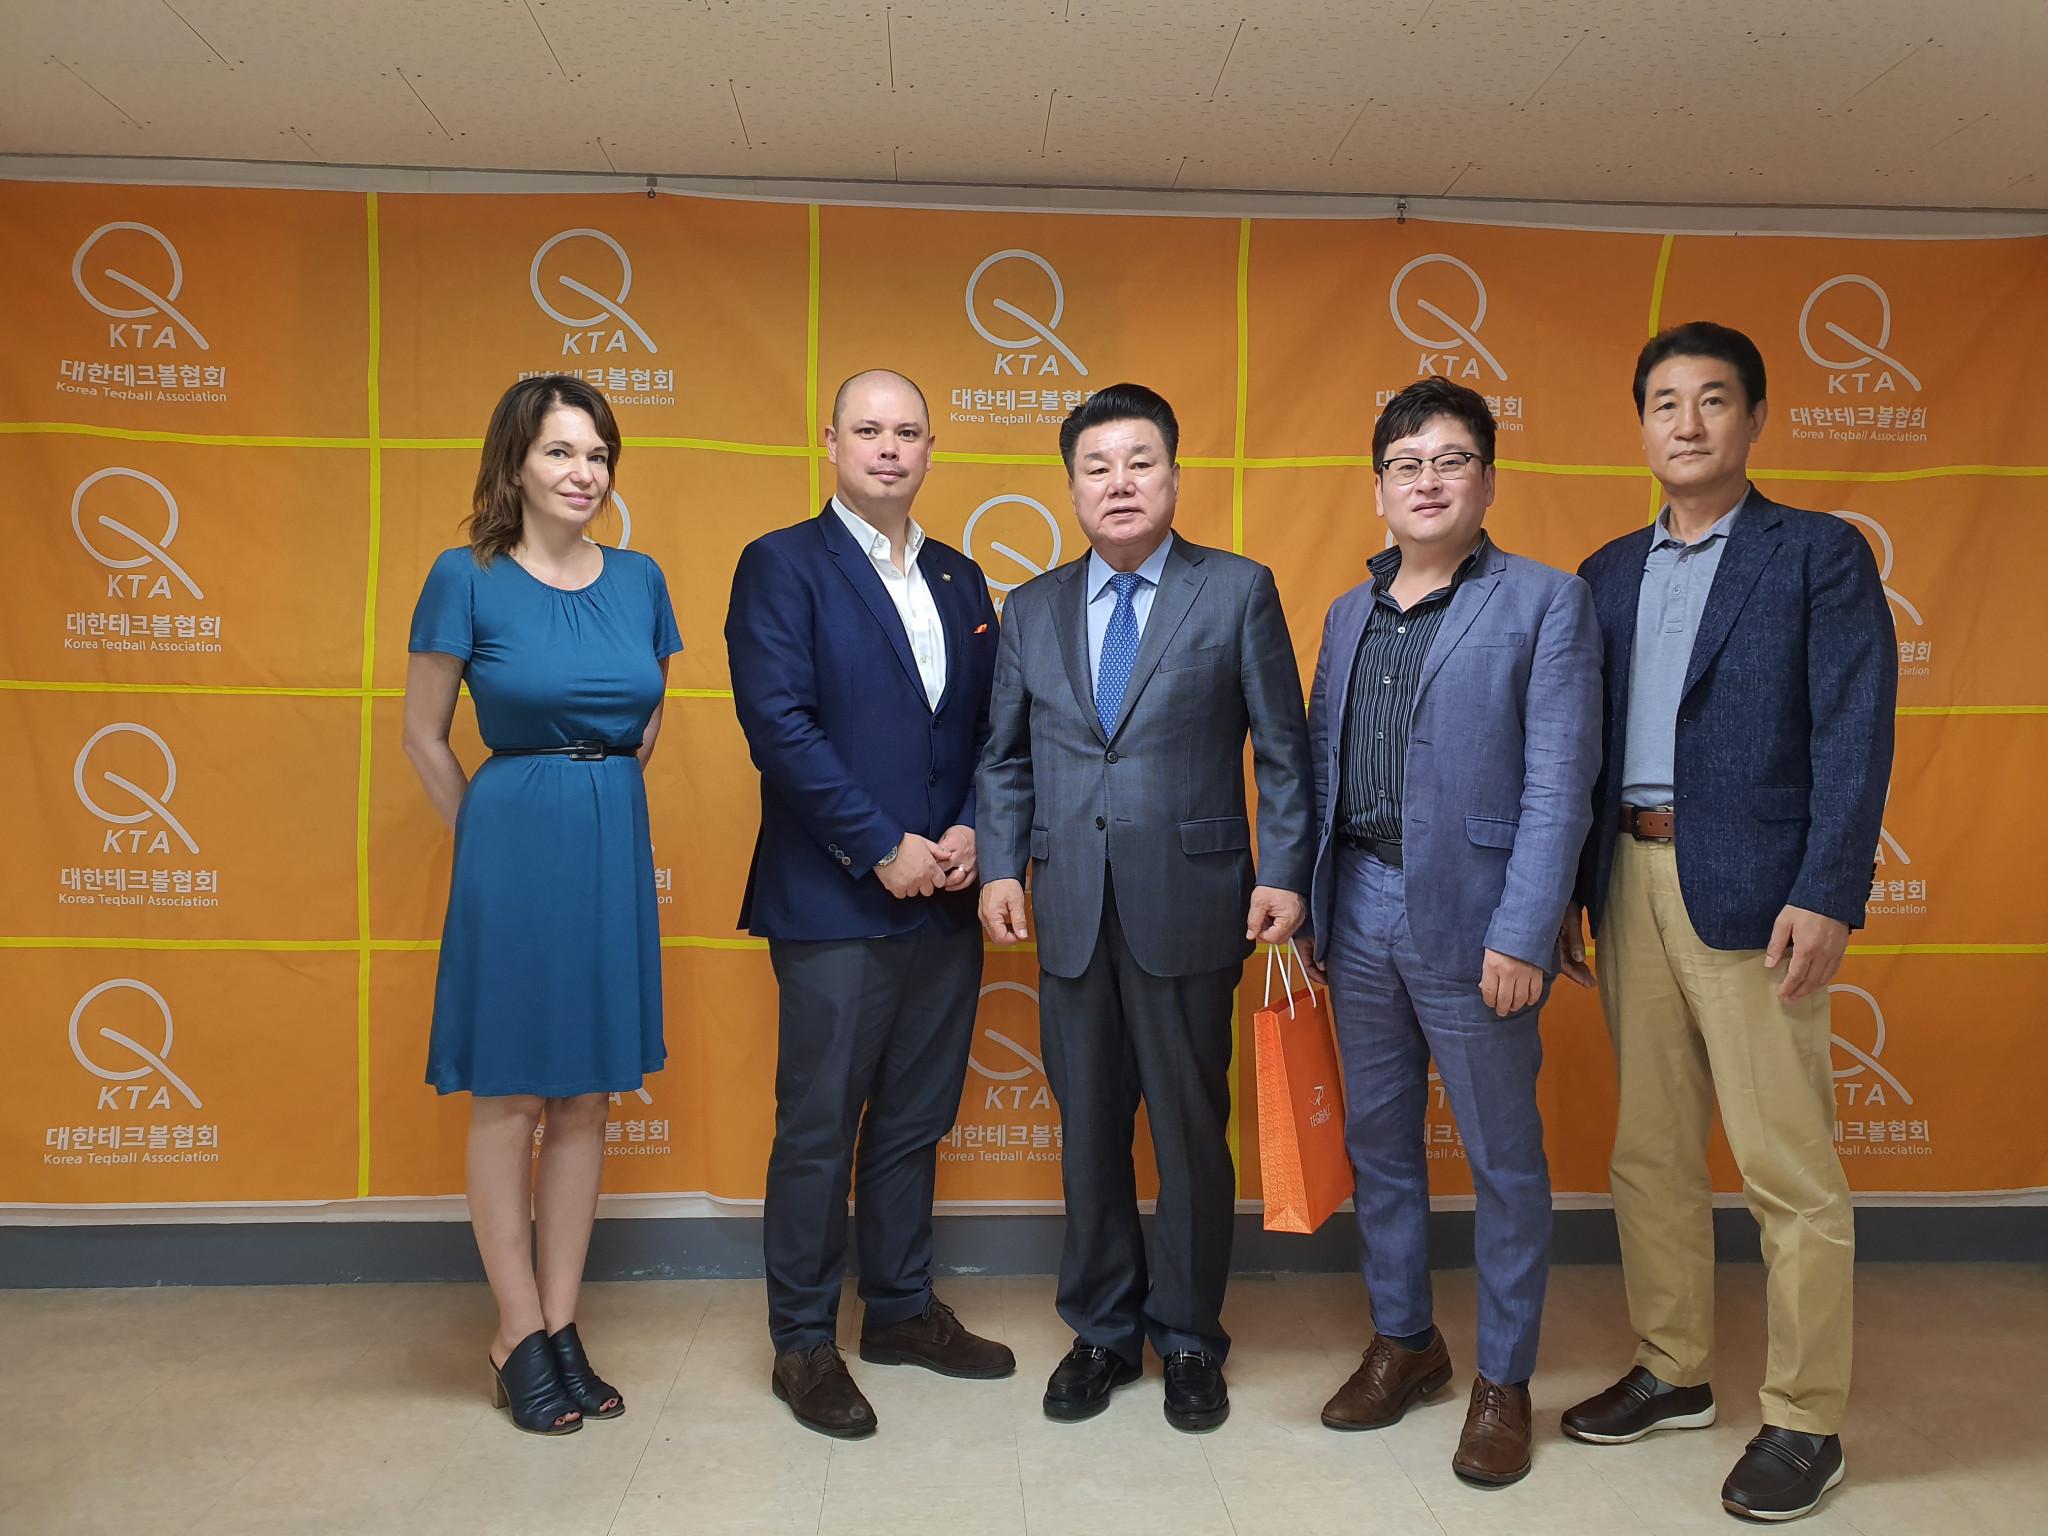 The Korea Teqball Association has signed a memorandum of understanding with Seoul National University ©FITEQ